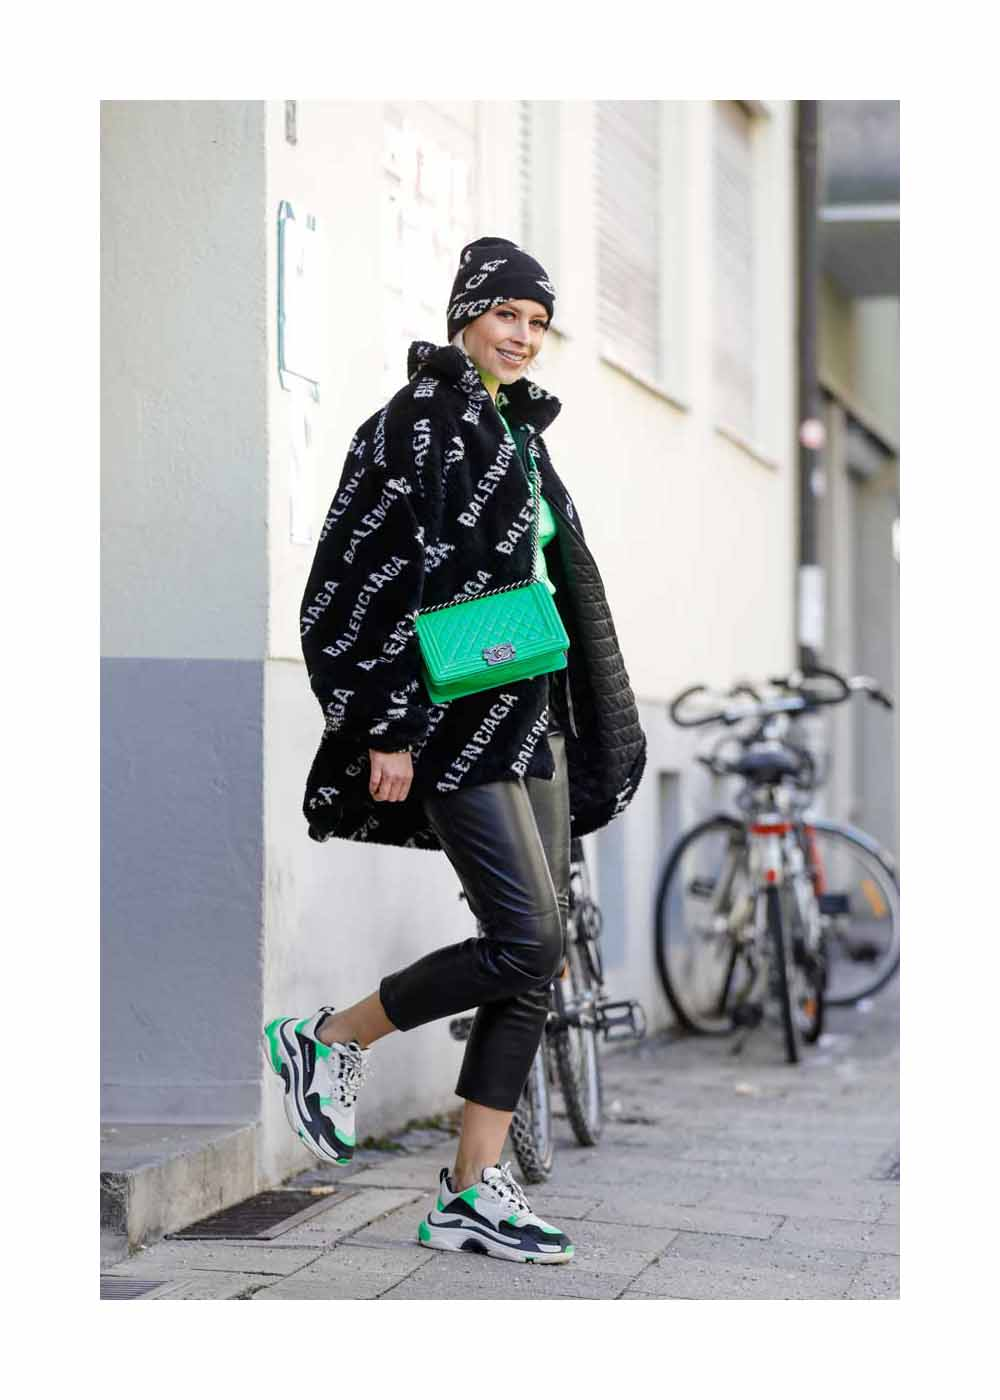 Verena Kerth Street Style Shooting In Munich